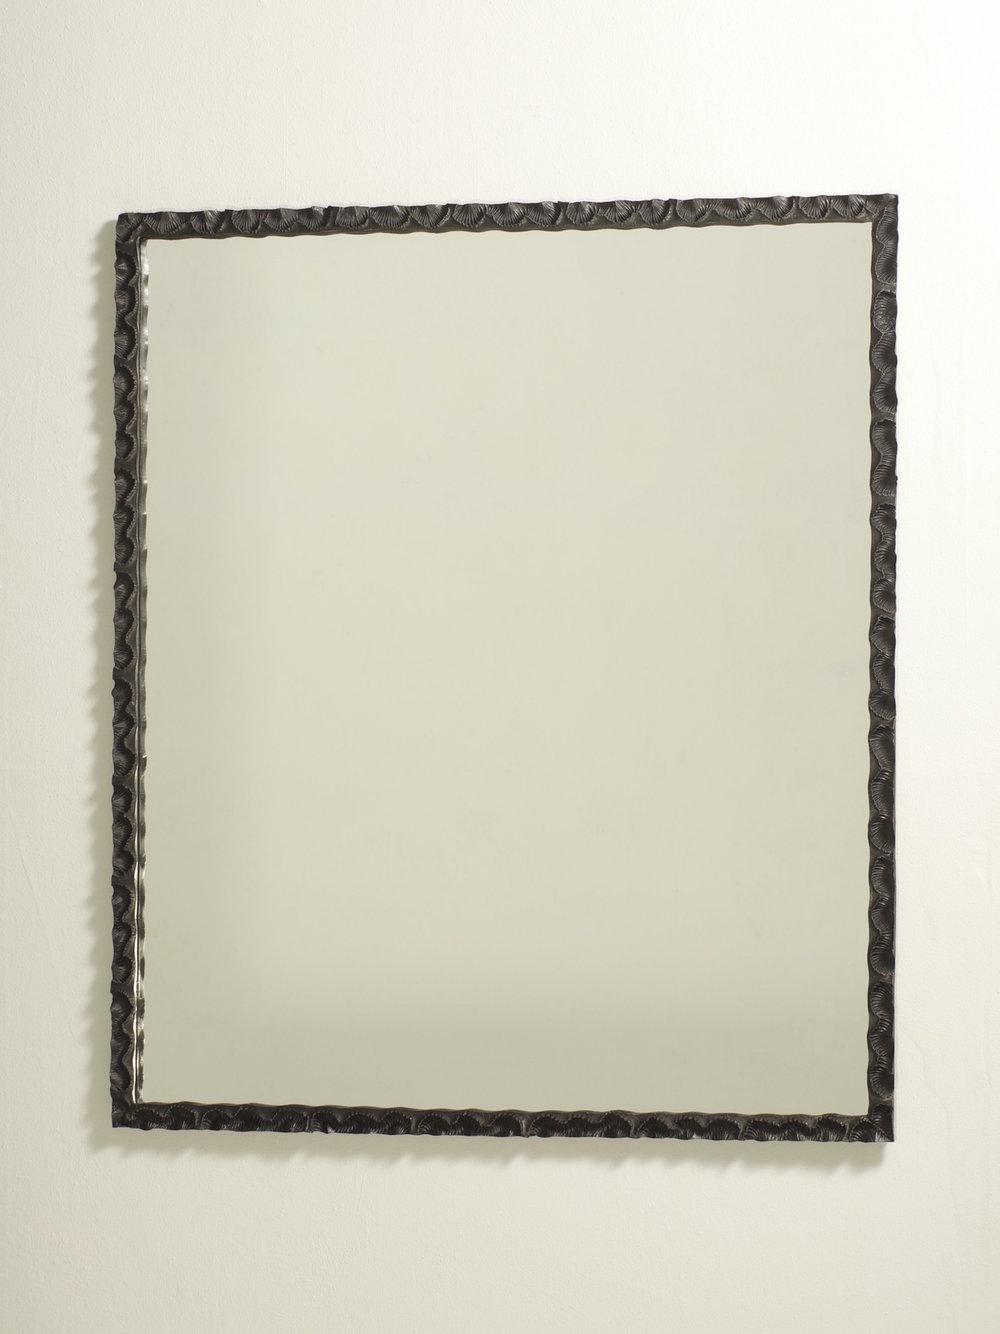 'Spirifer' - rectangular 2010 (black)    Bronze float glass    850w X 990h X 30 mm deep    Ed of 5 - 3 AP